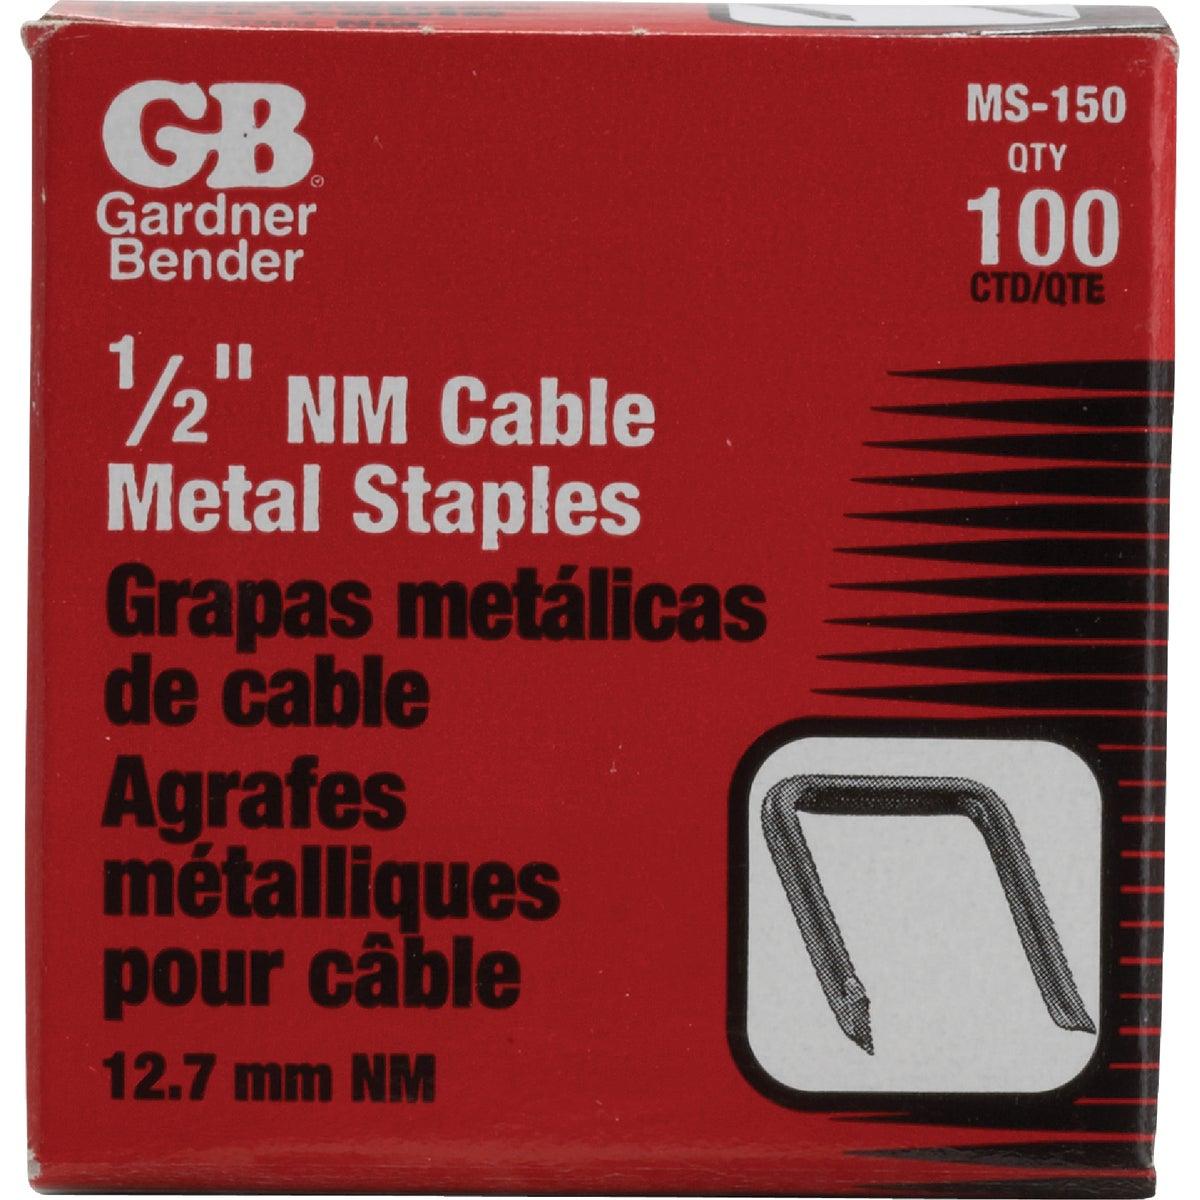 "100PK 1/2"" METAL STAPLE - MS-150 by G B Electrical Inc"